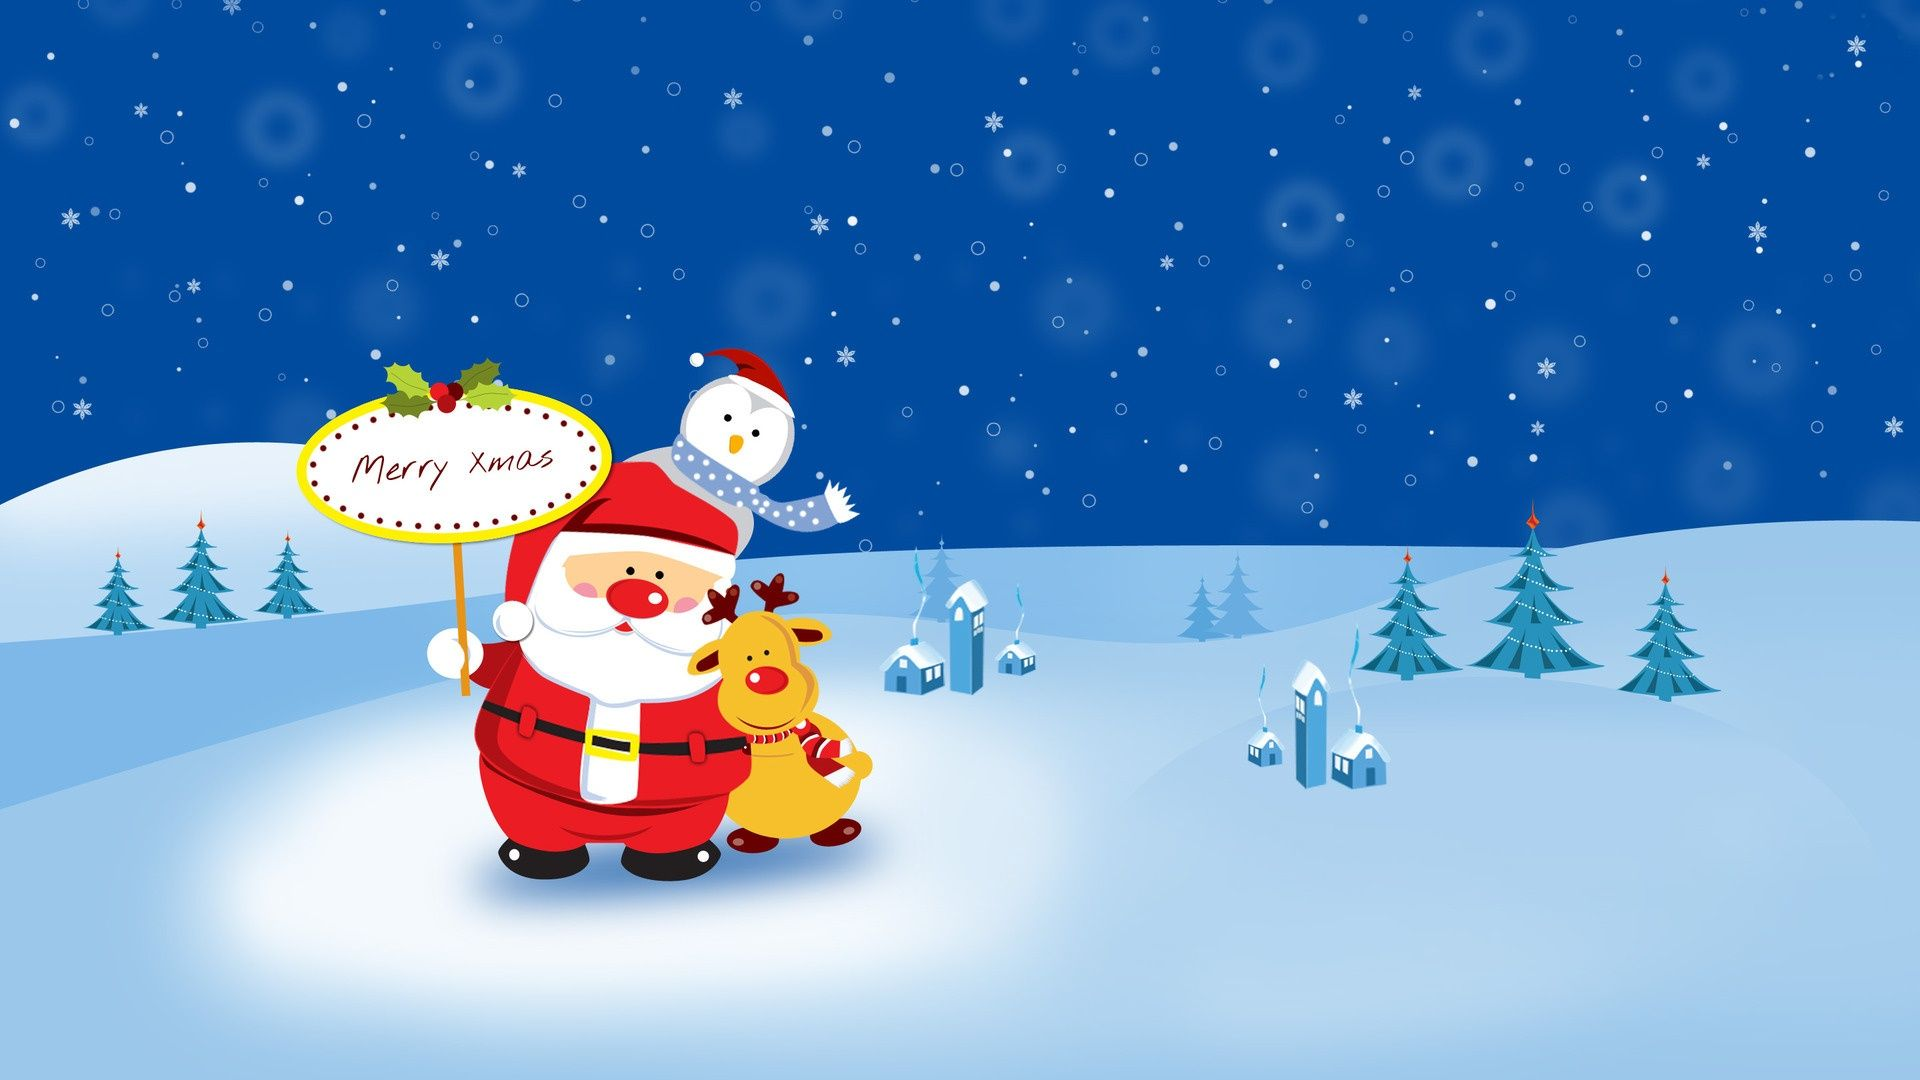 Wallpaper iphone natal - Cute Cartoon Christmas Images Cute Cartoon Christmas Wallpaper Cute Holiday S For Iphone Wallpaper